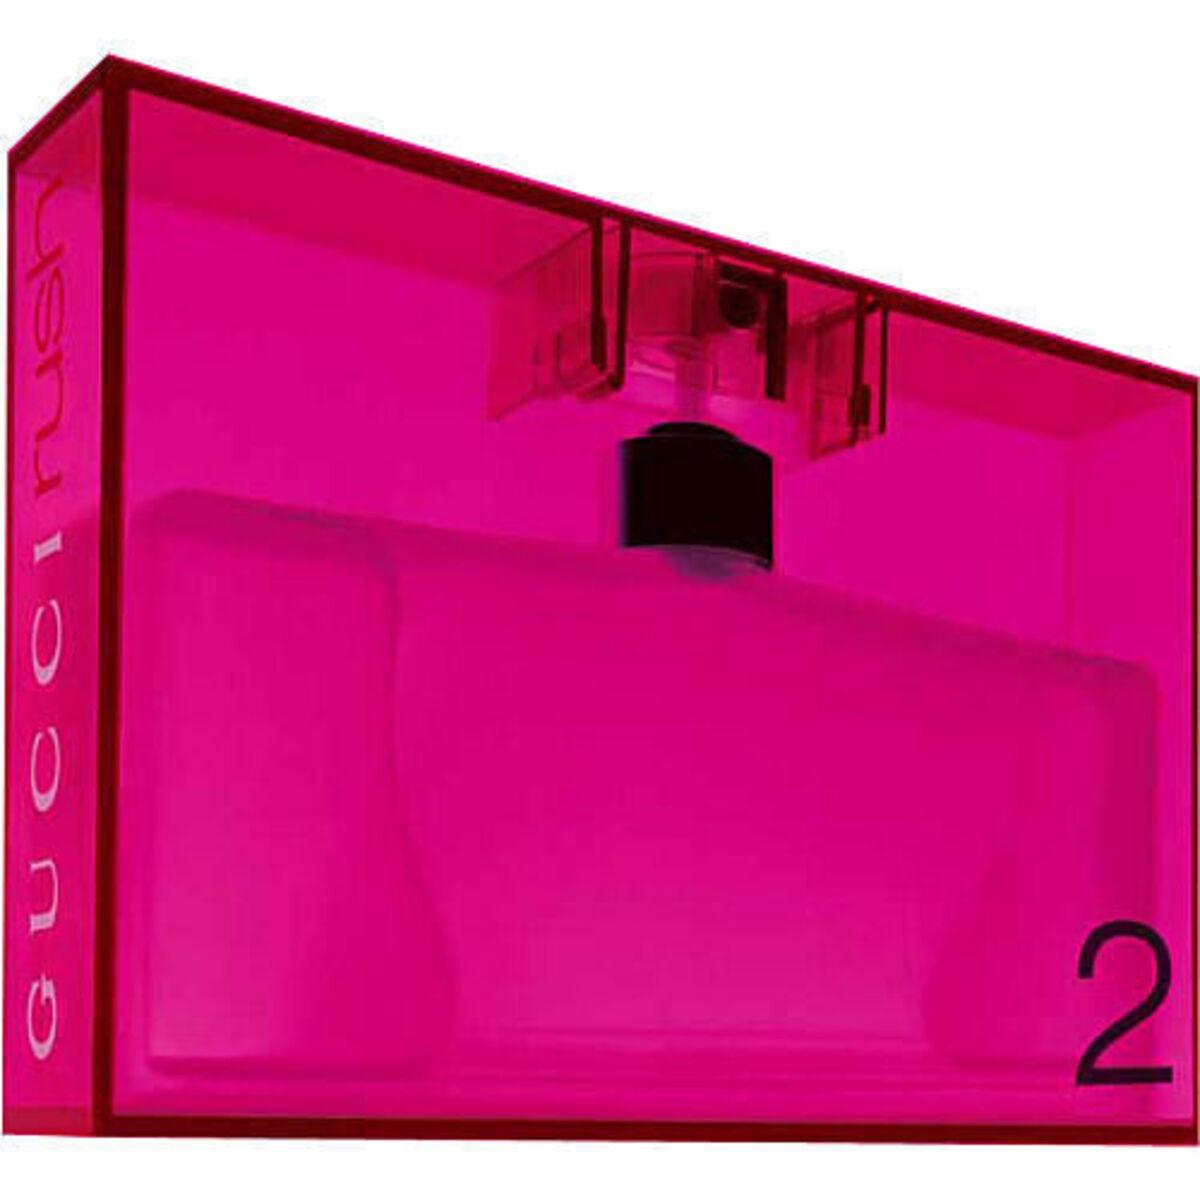 Bild 3 von Gucci Rush 2, Eau de Toilette, 50 ml